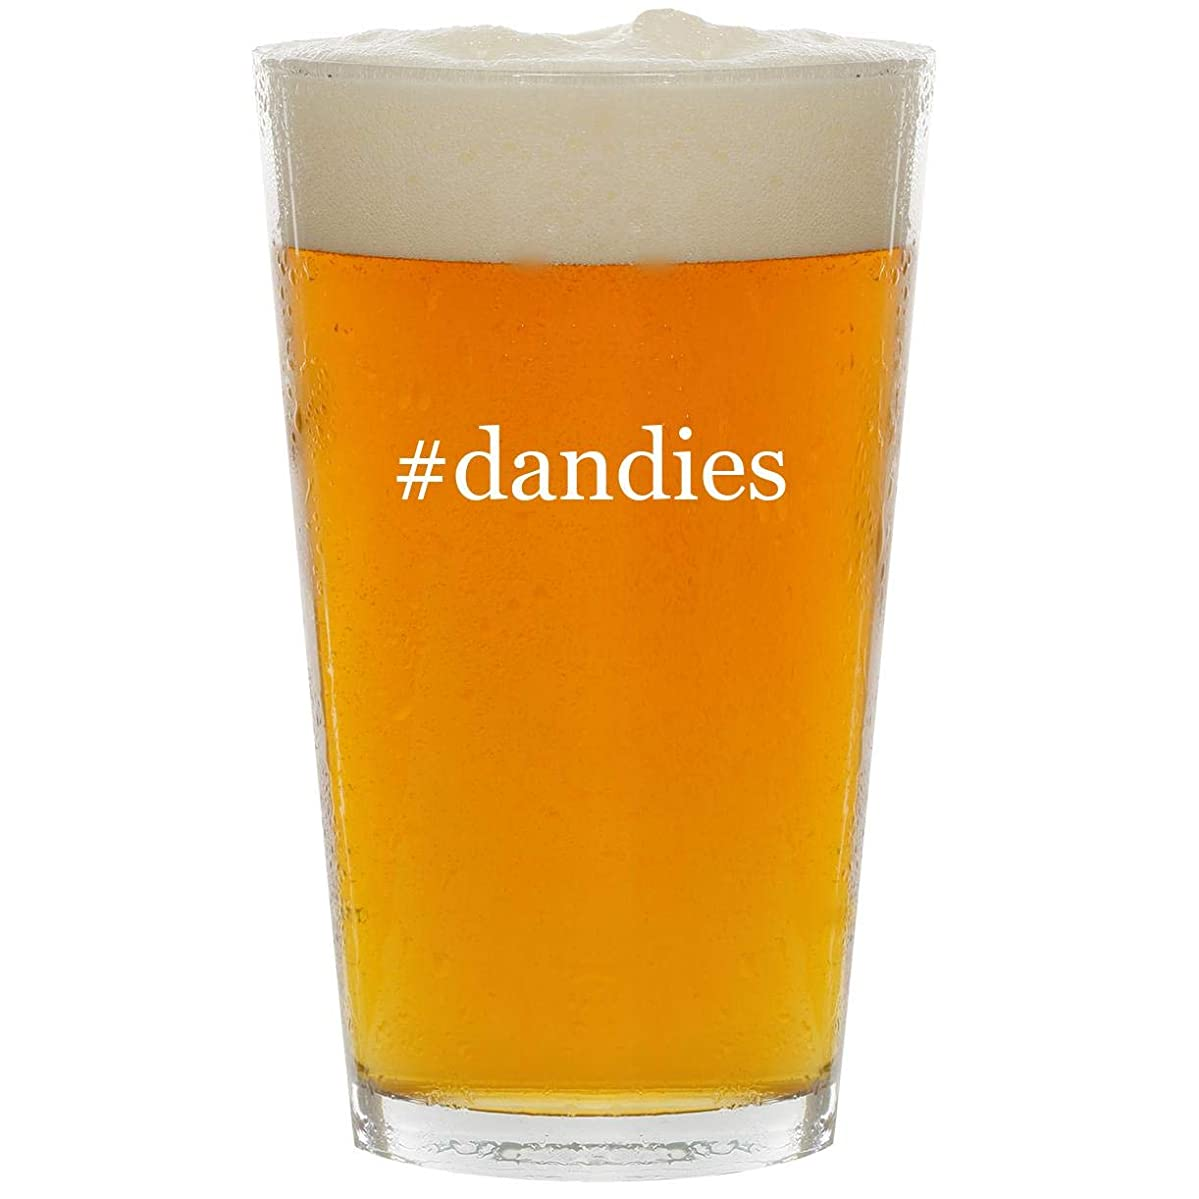 #dandies - Glass Hashtag 16oz Beer Pint